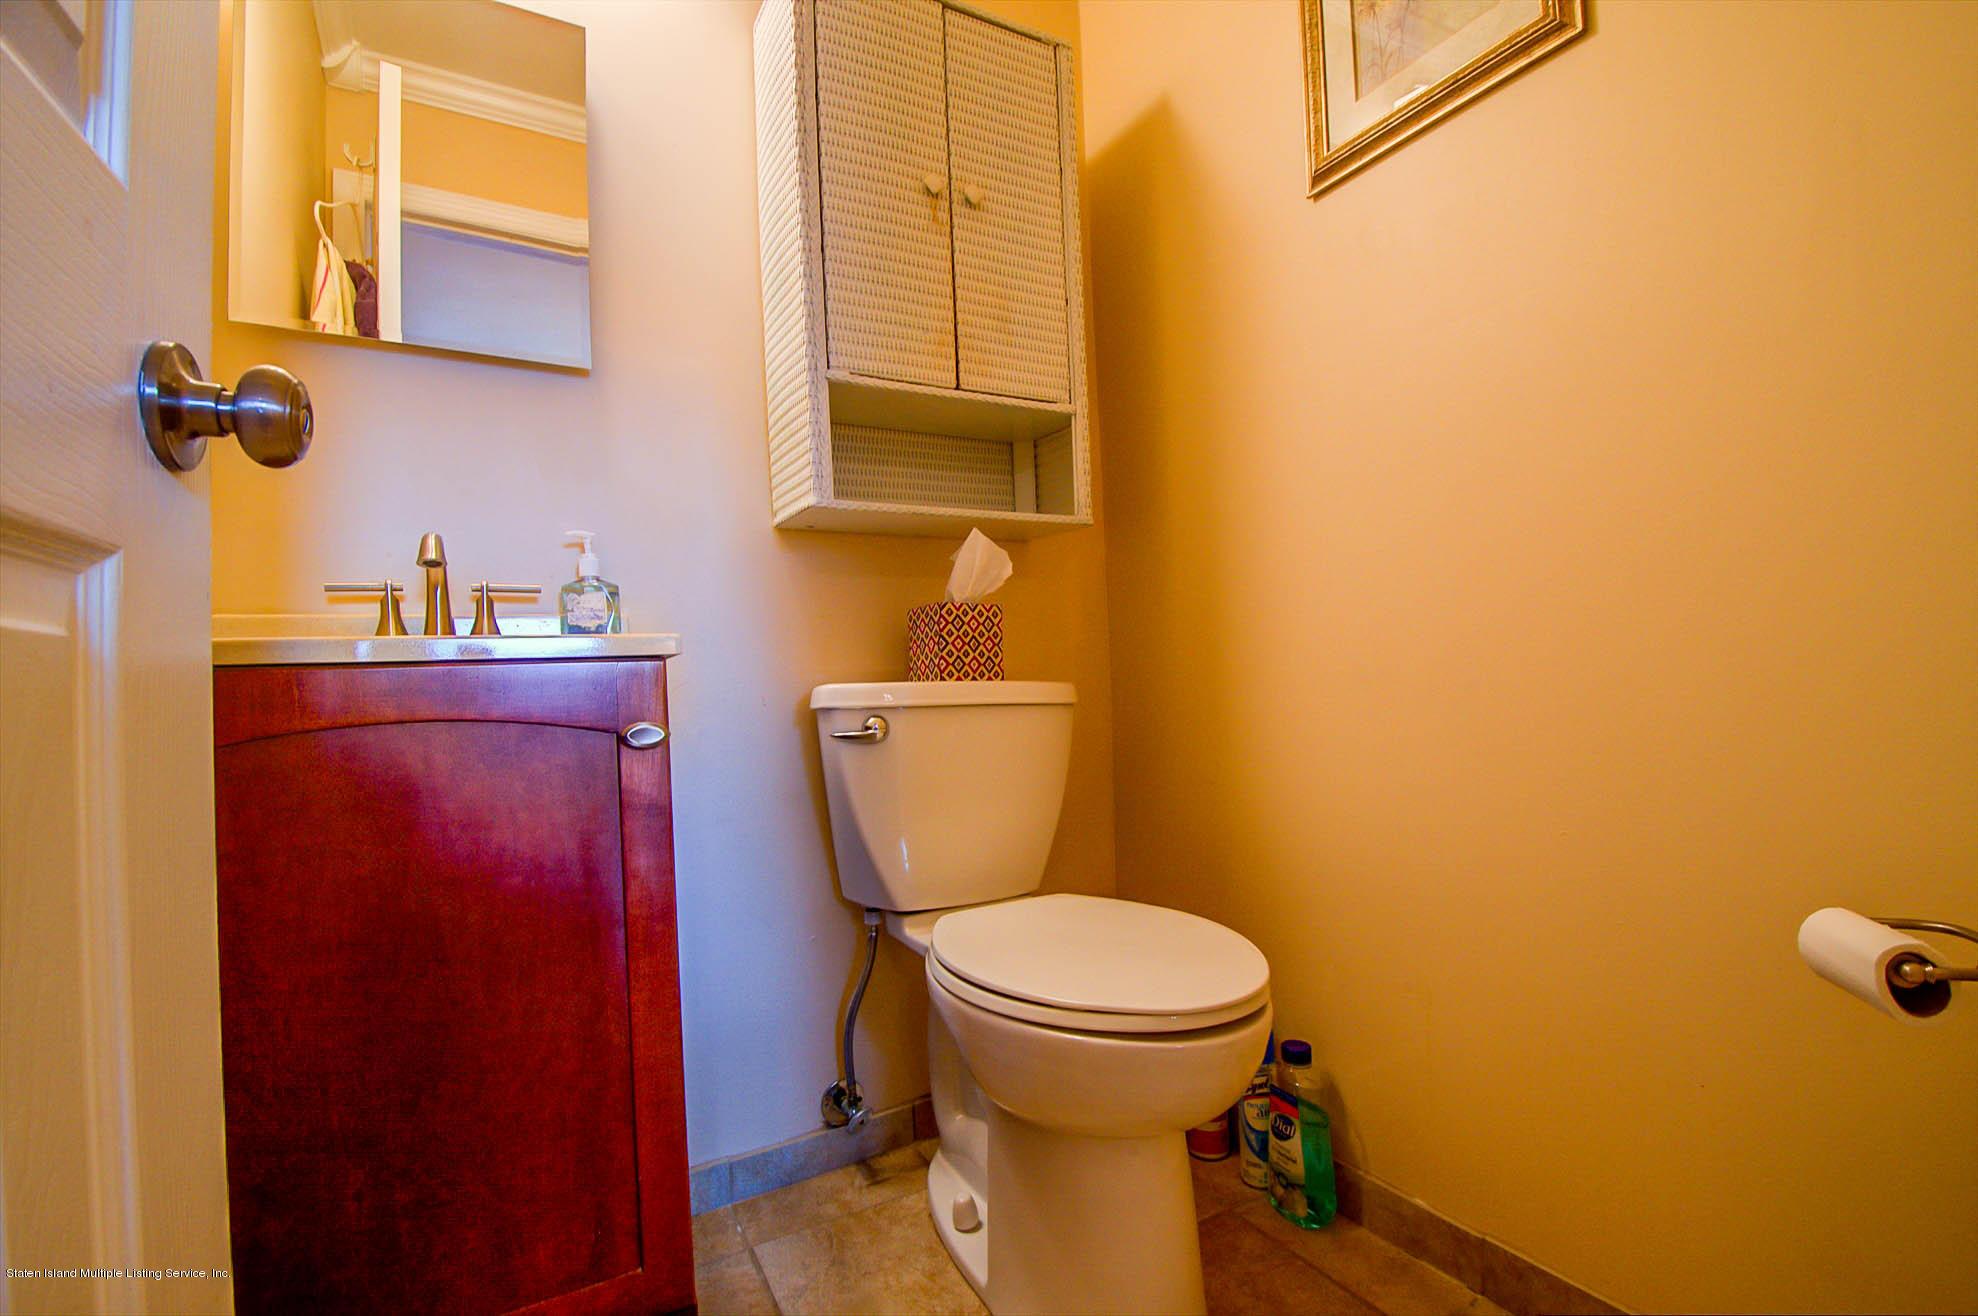 130 Evergreen Street,Staten Island,New York,10308,United States,4 Bedrooms Bedrooms,9 Rooms Rooms,3 BathroomsBathrooms,Residential,Evergreen,1133694